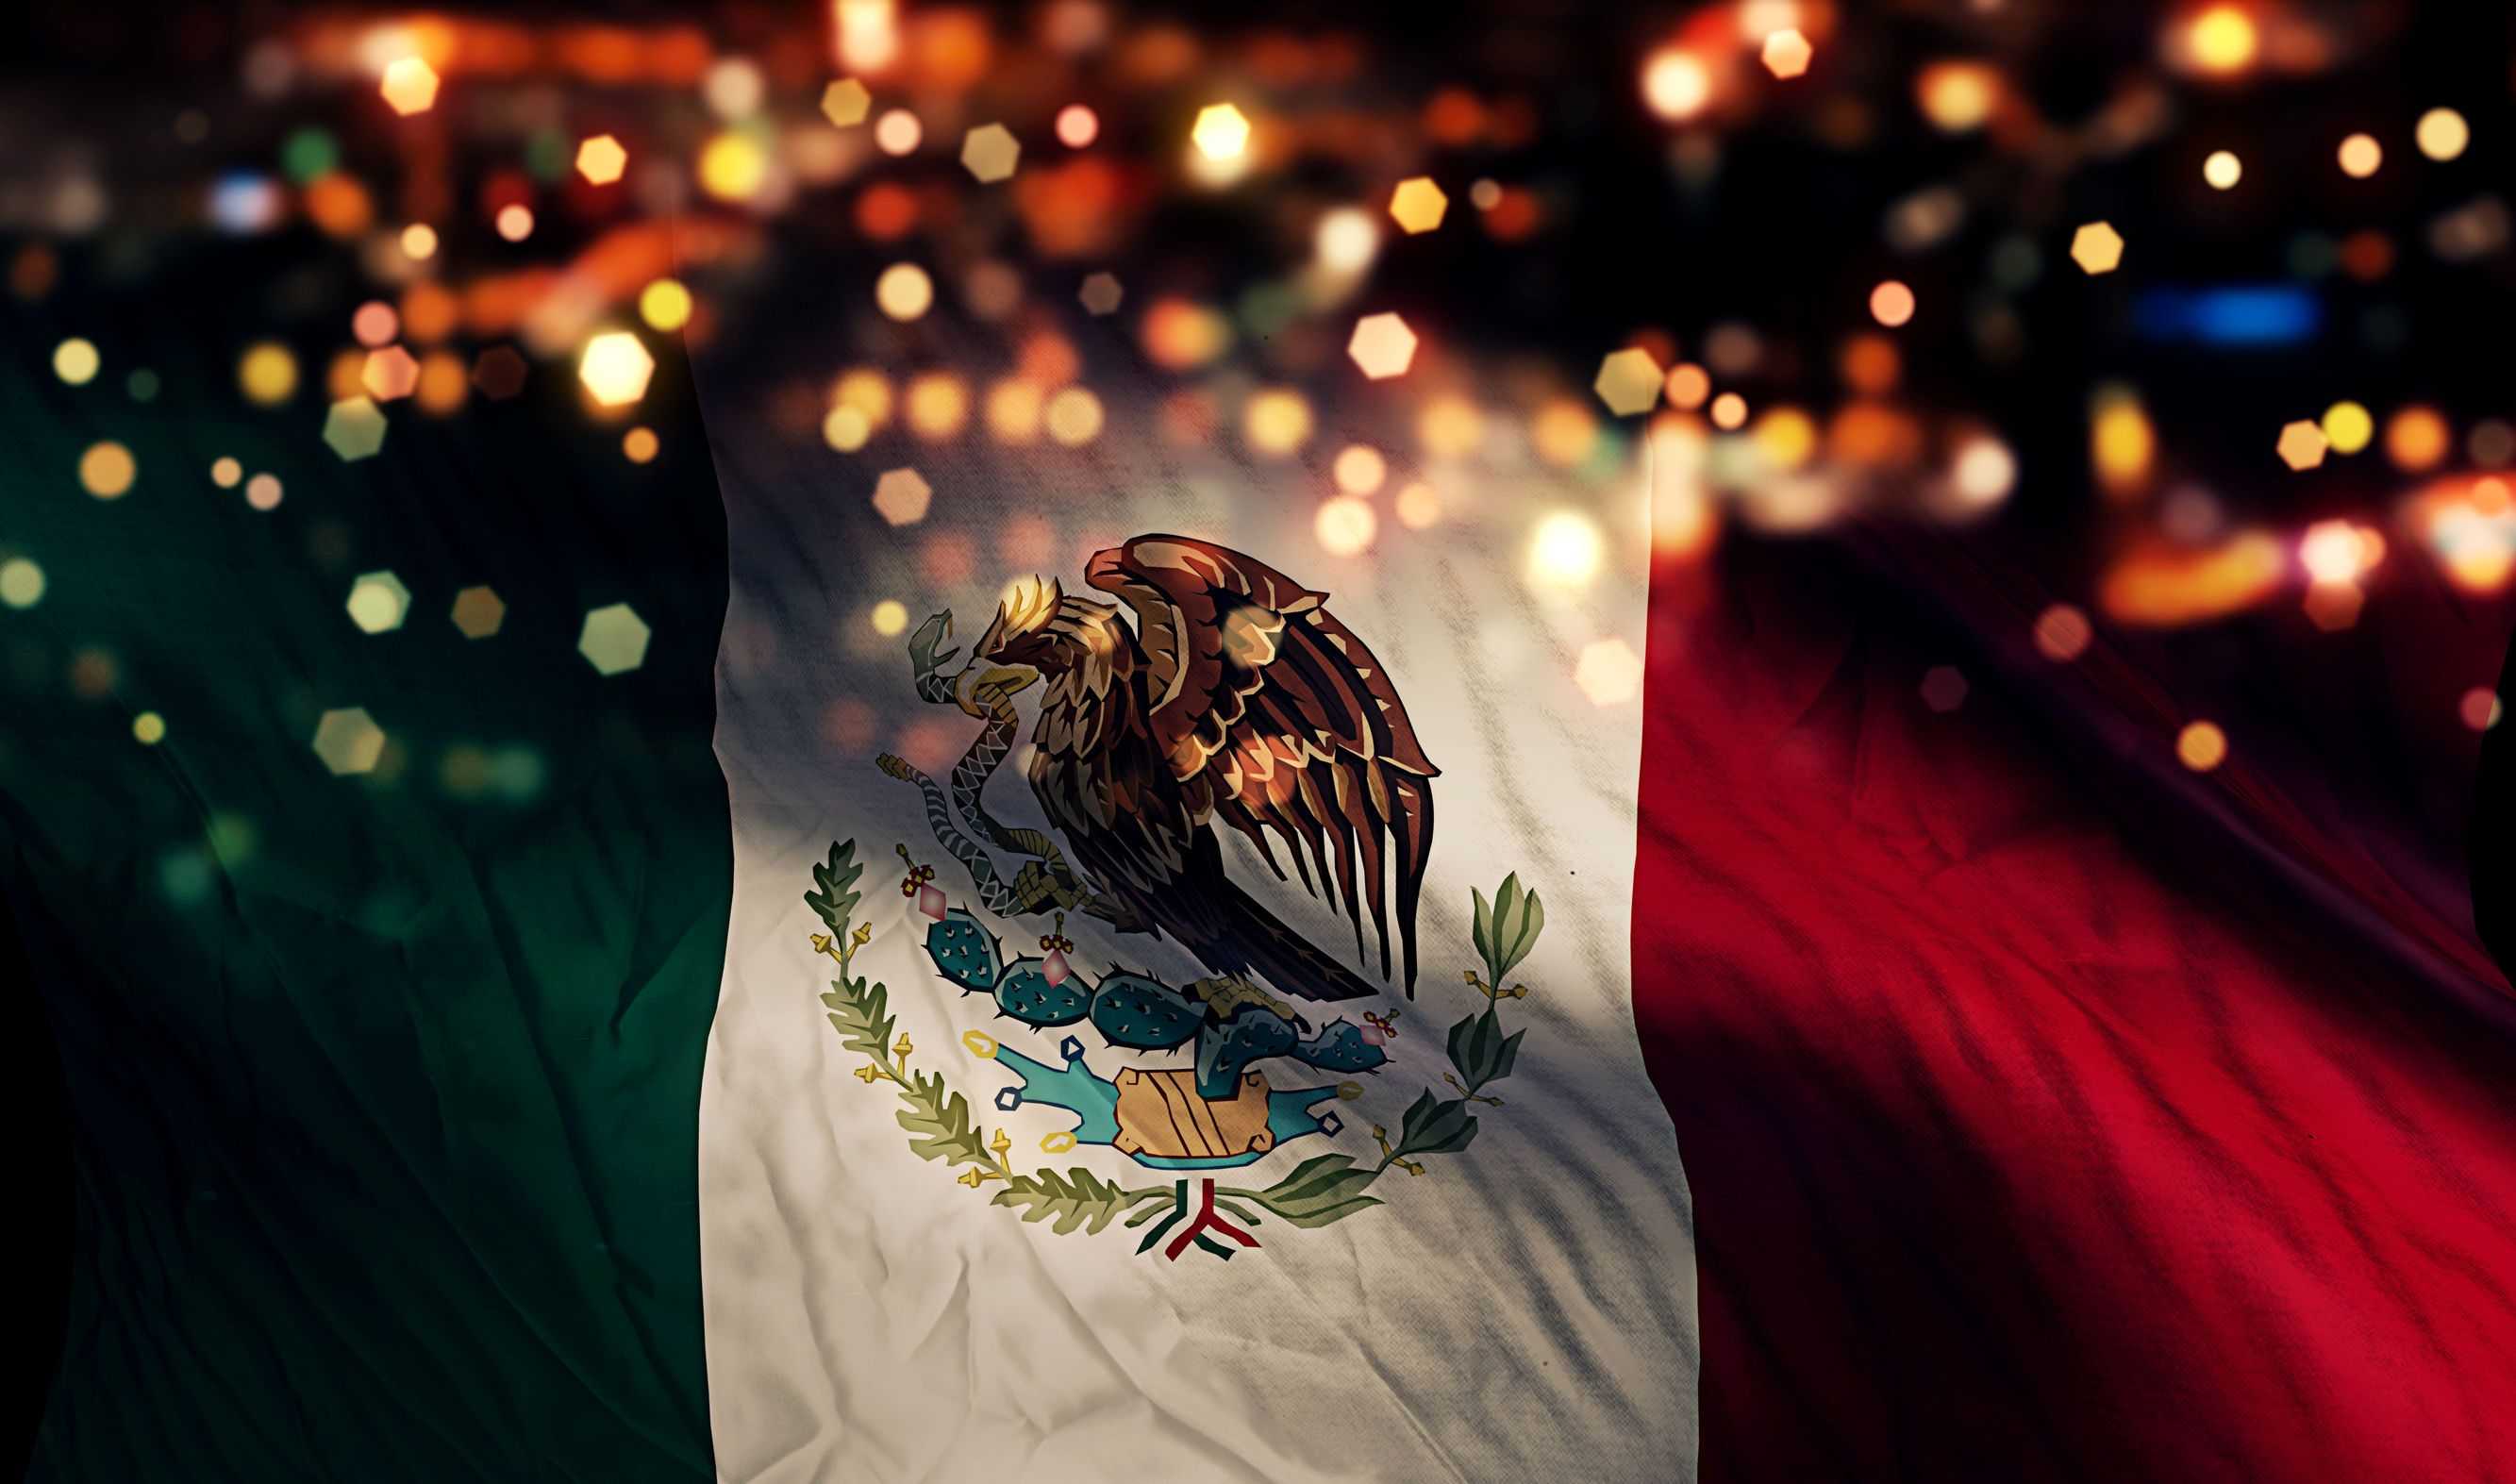 Diadelaindependencia Lospilonesamsterdam Bestmexicanfood Amaterdamrestaurants Bestmargaritas Lekker M Mexico Wallpaper Mexican Culture Art Mexican Flags